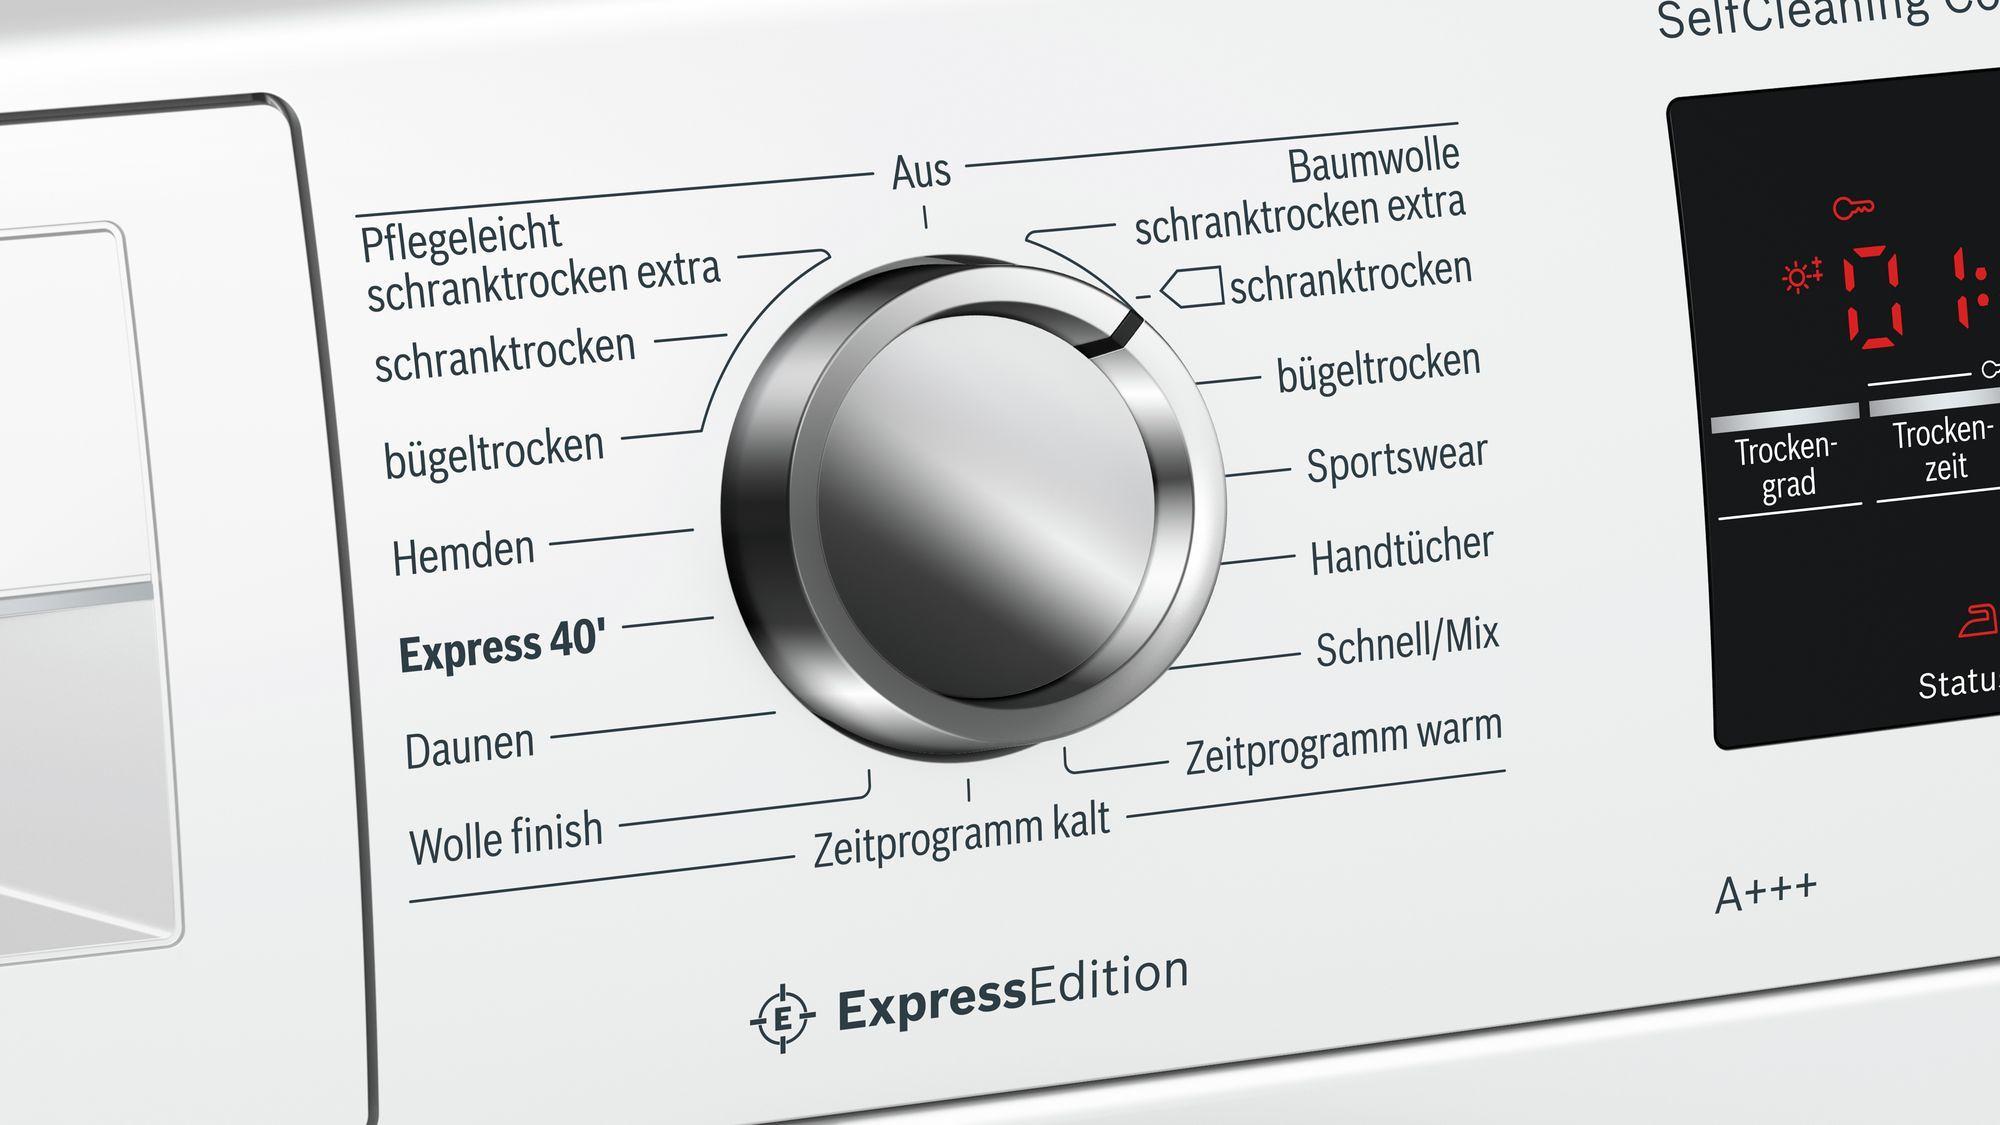 Bosch wtw h kg a wärmepumpentrockner selfcleaning